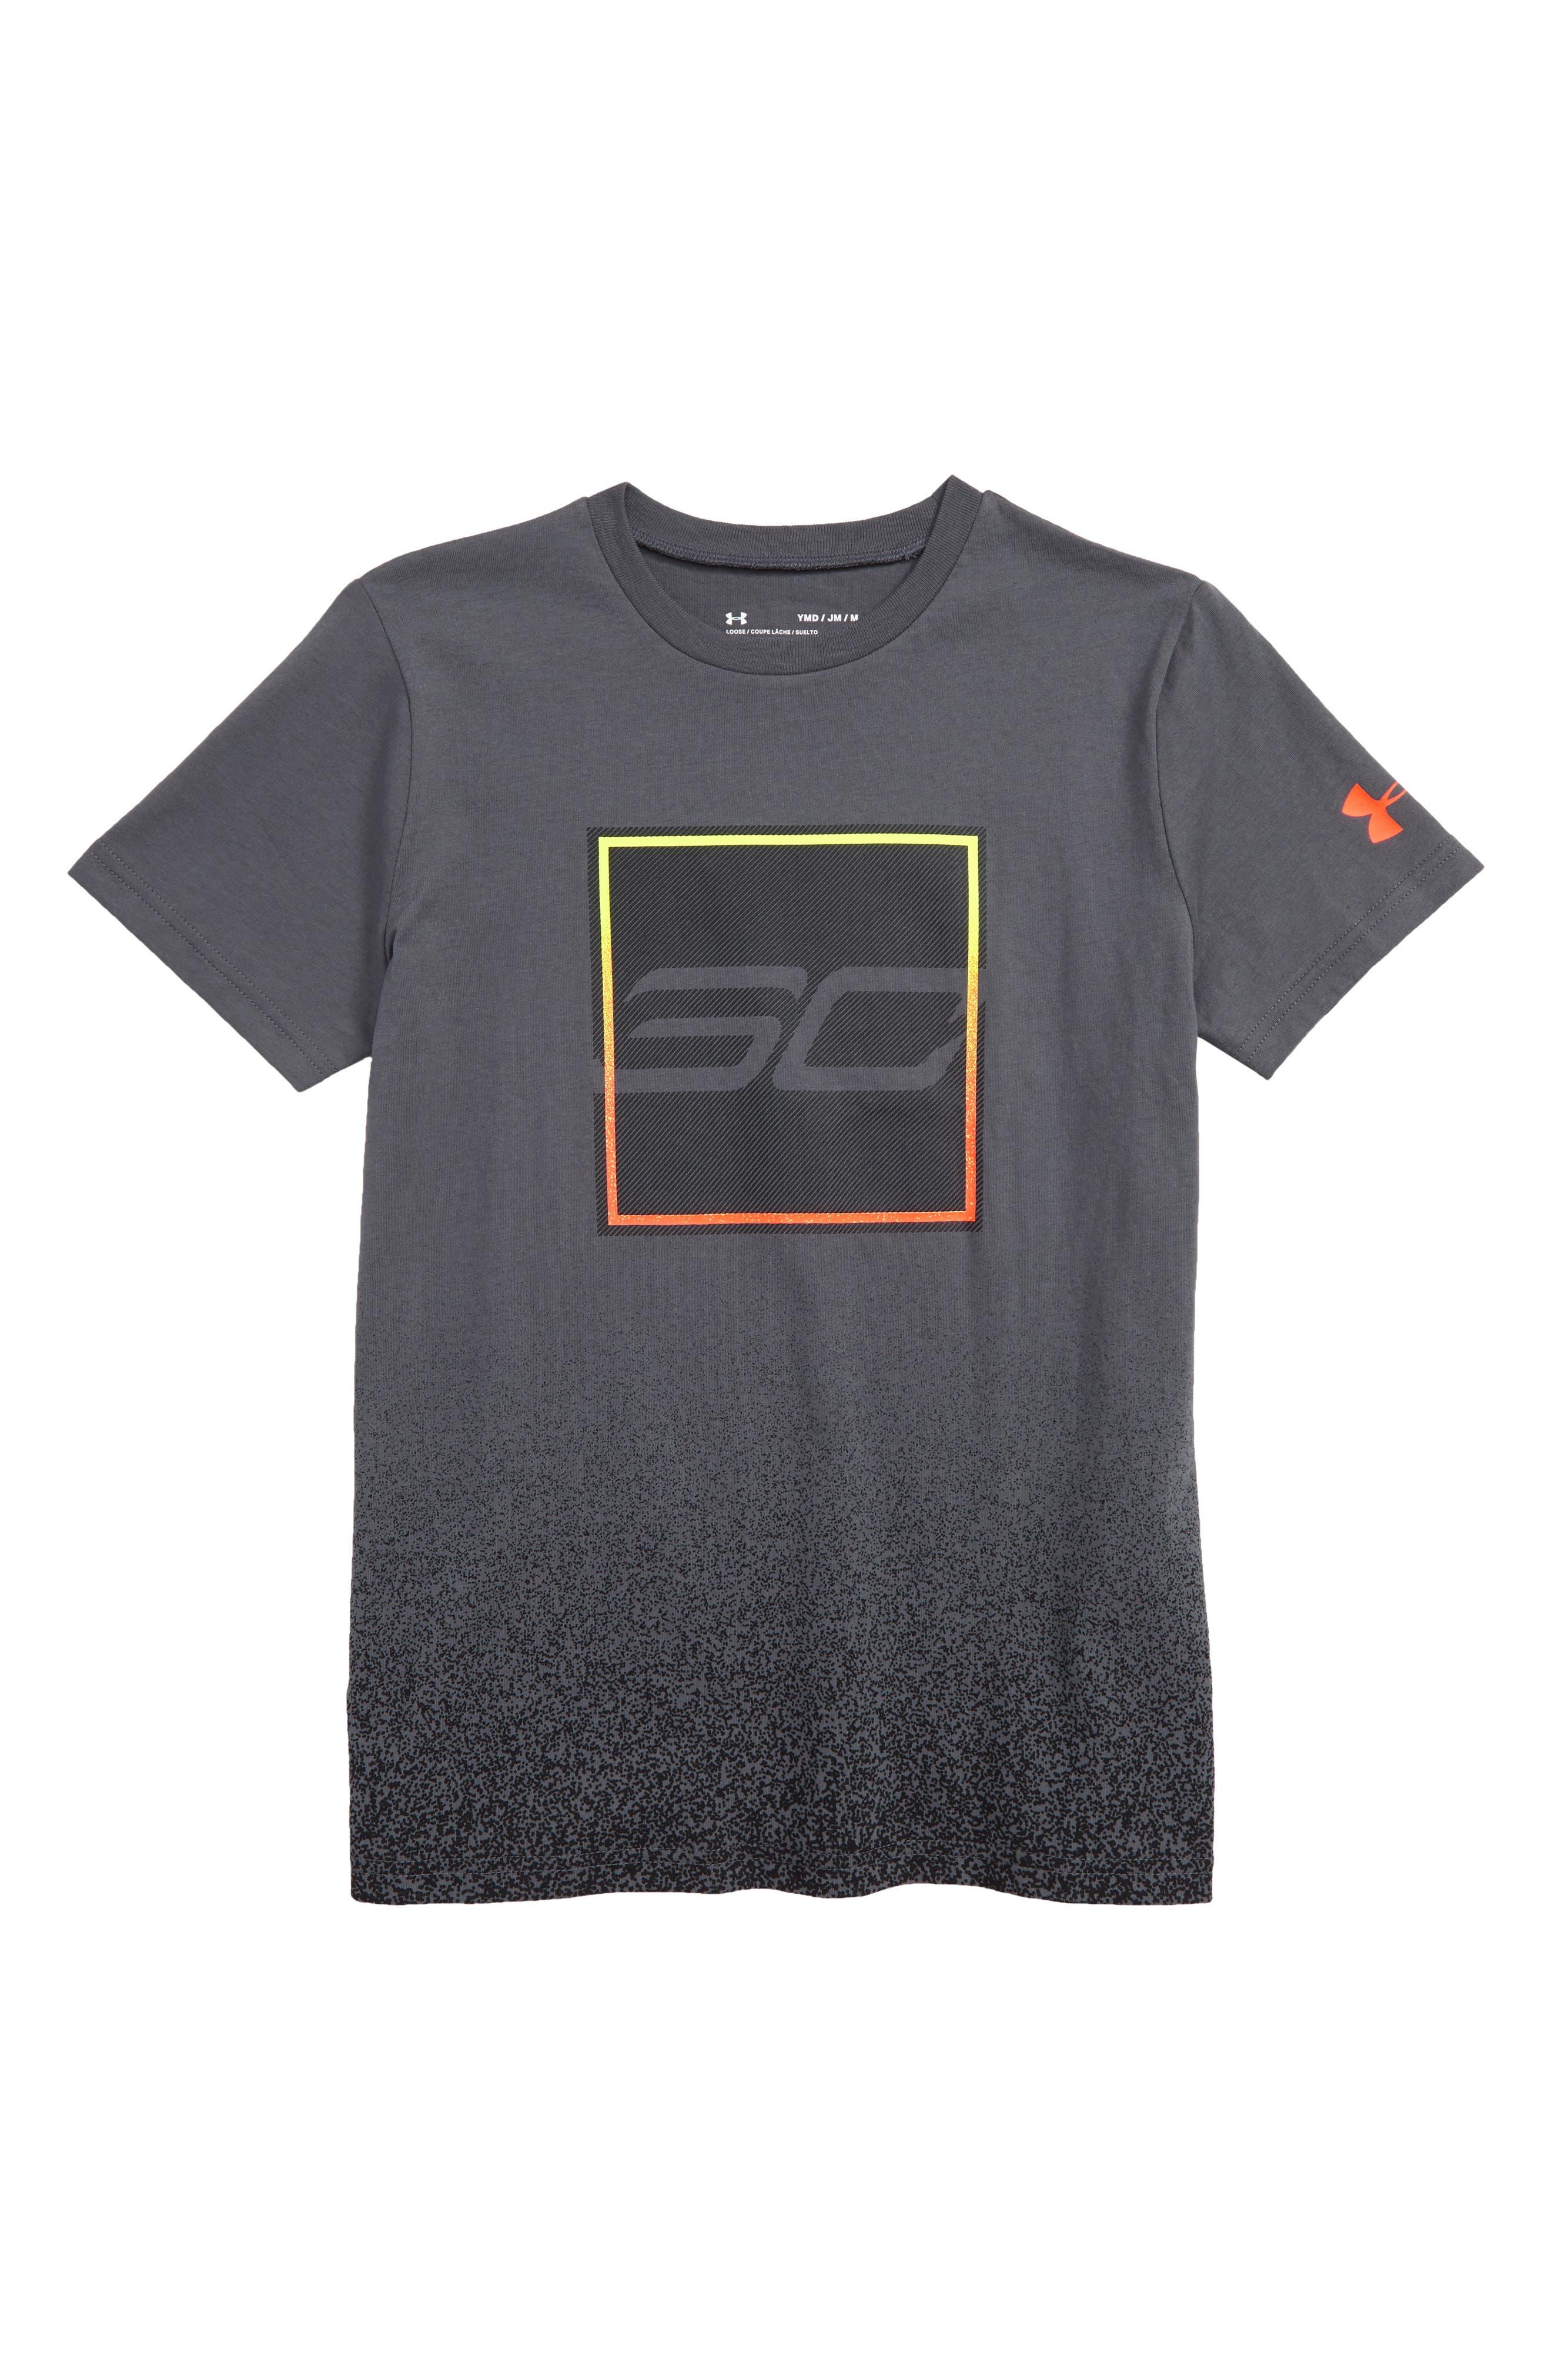 UNDER ARMOUR,                             SC30 Box HeatGear<sup>®</sup> T-Shirt,                             Main thumbnail 1, color,                             PITCH GRAY/ ORANGE GLITCH